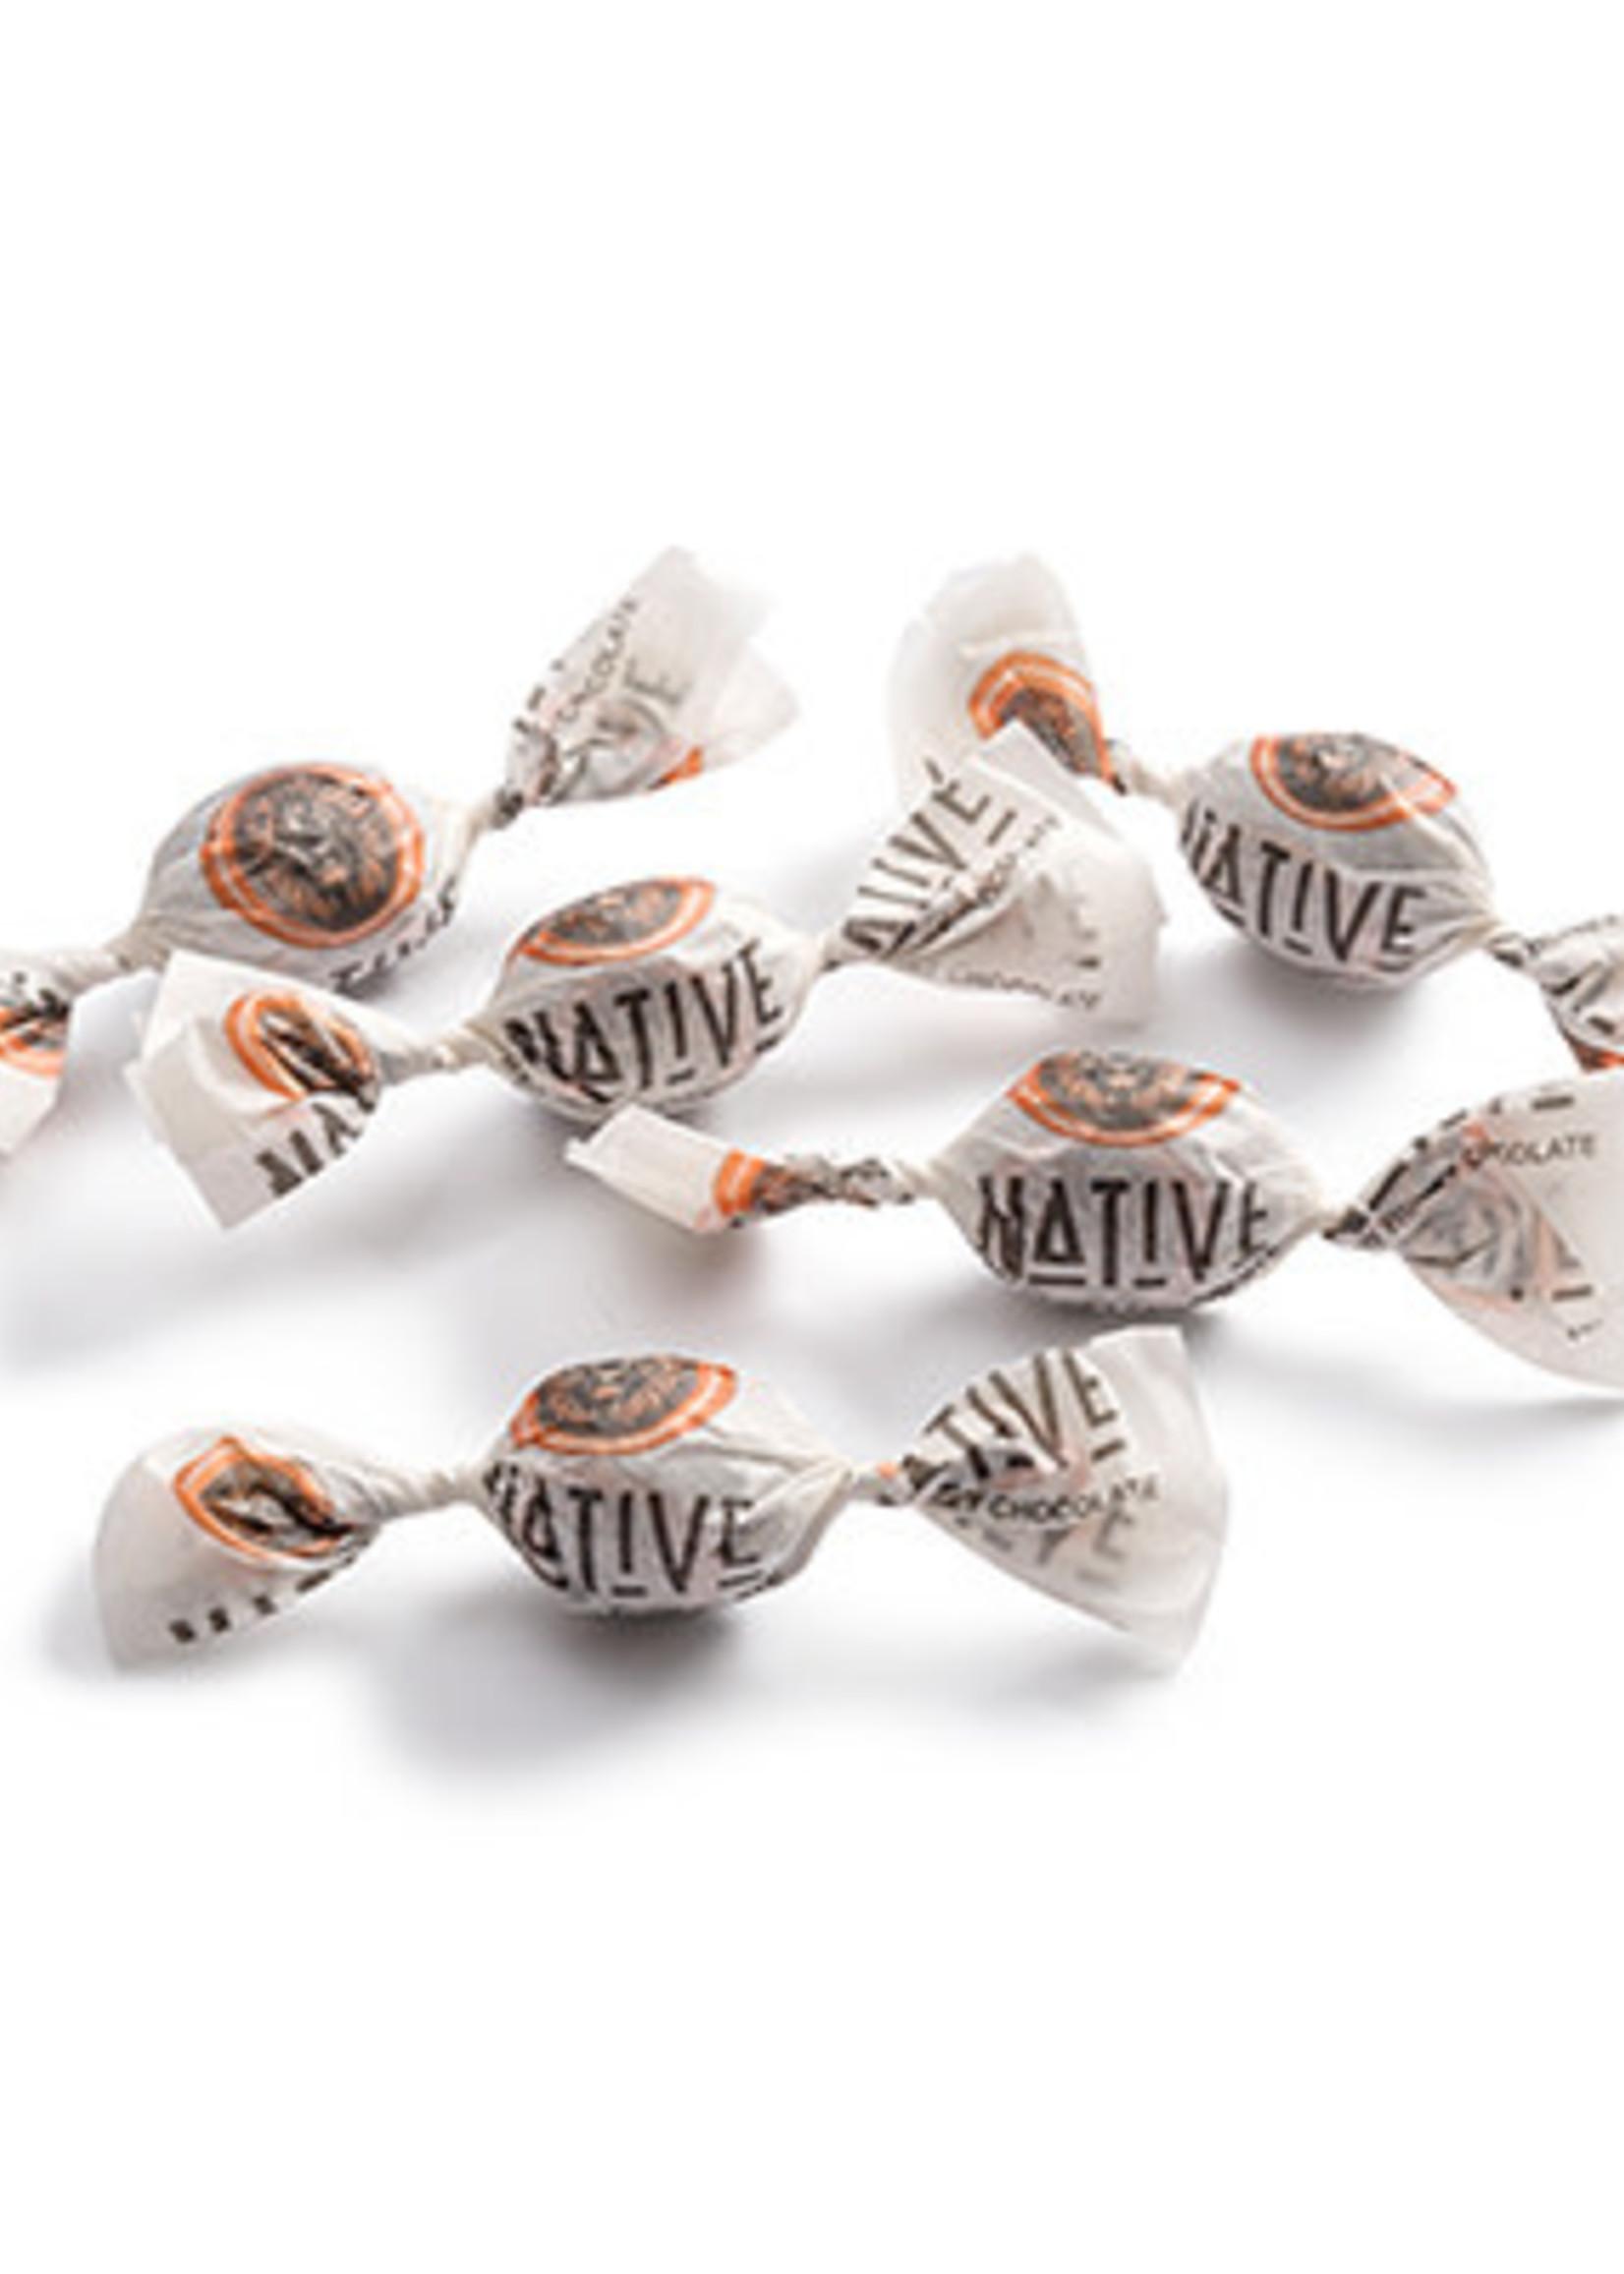 Native Native - Single Wrapped Almond- Raw Honey & Choc